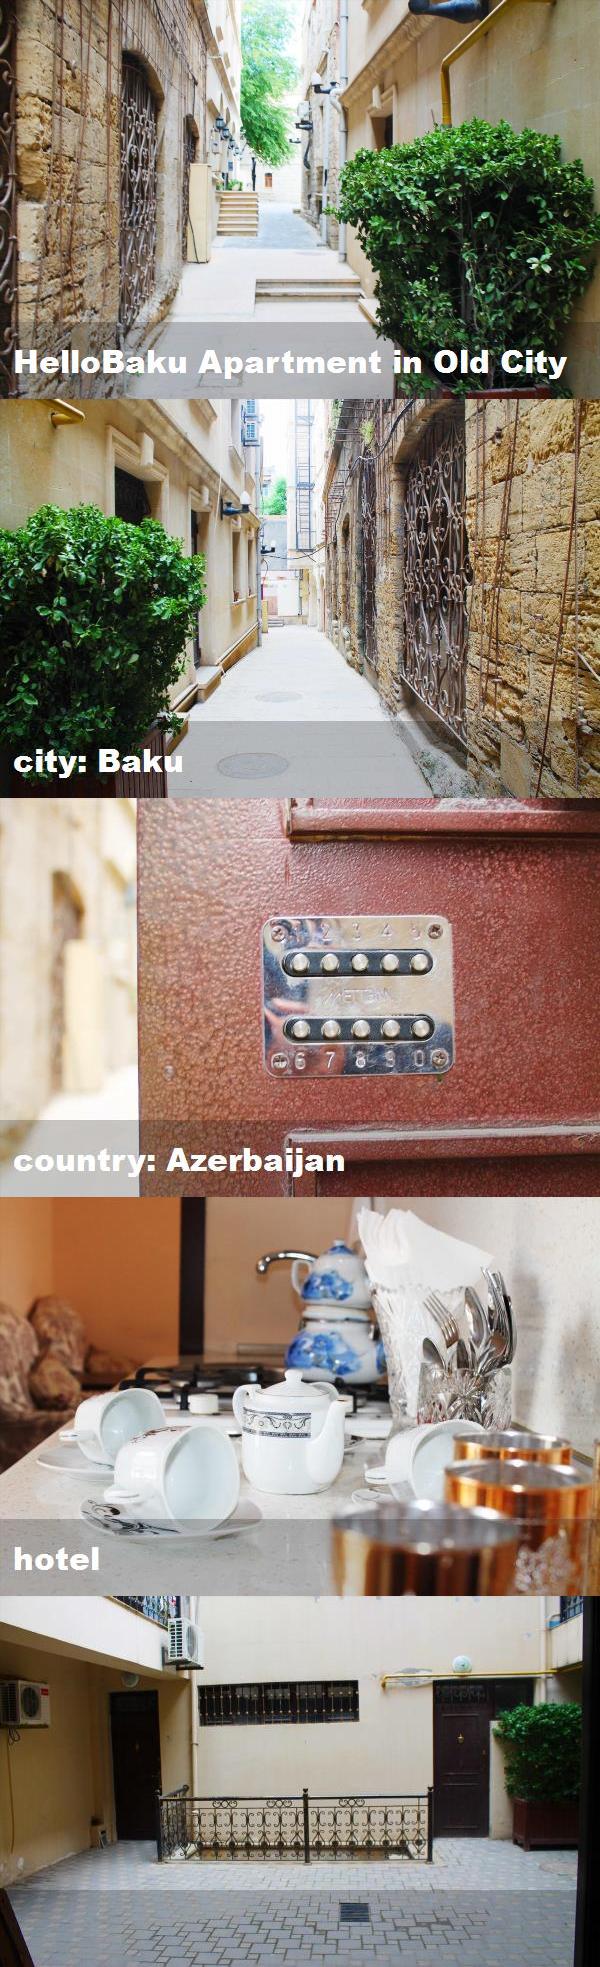 Hellobaku Apartment In Old City City Baku Country Azerbaijan Hotel Hotel Baku City Old City